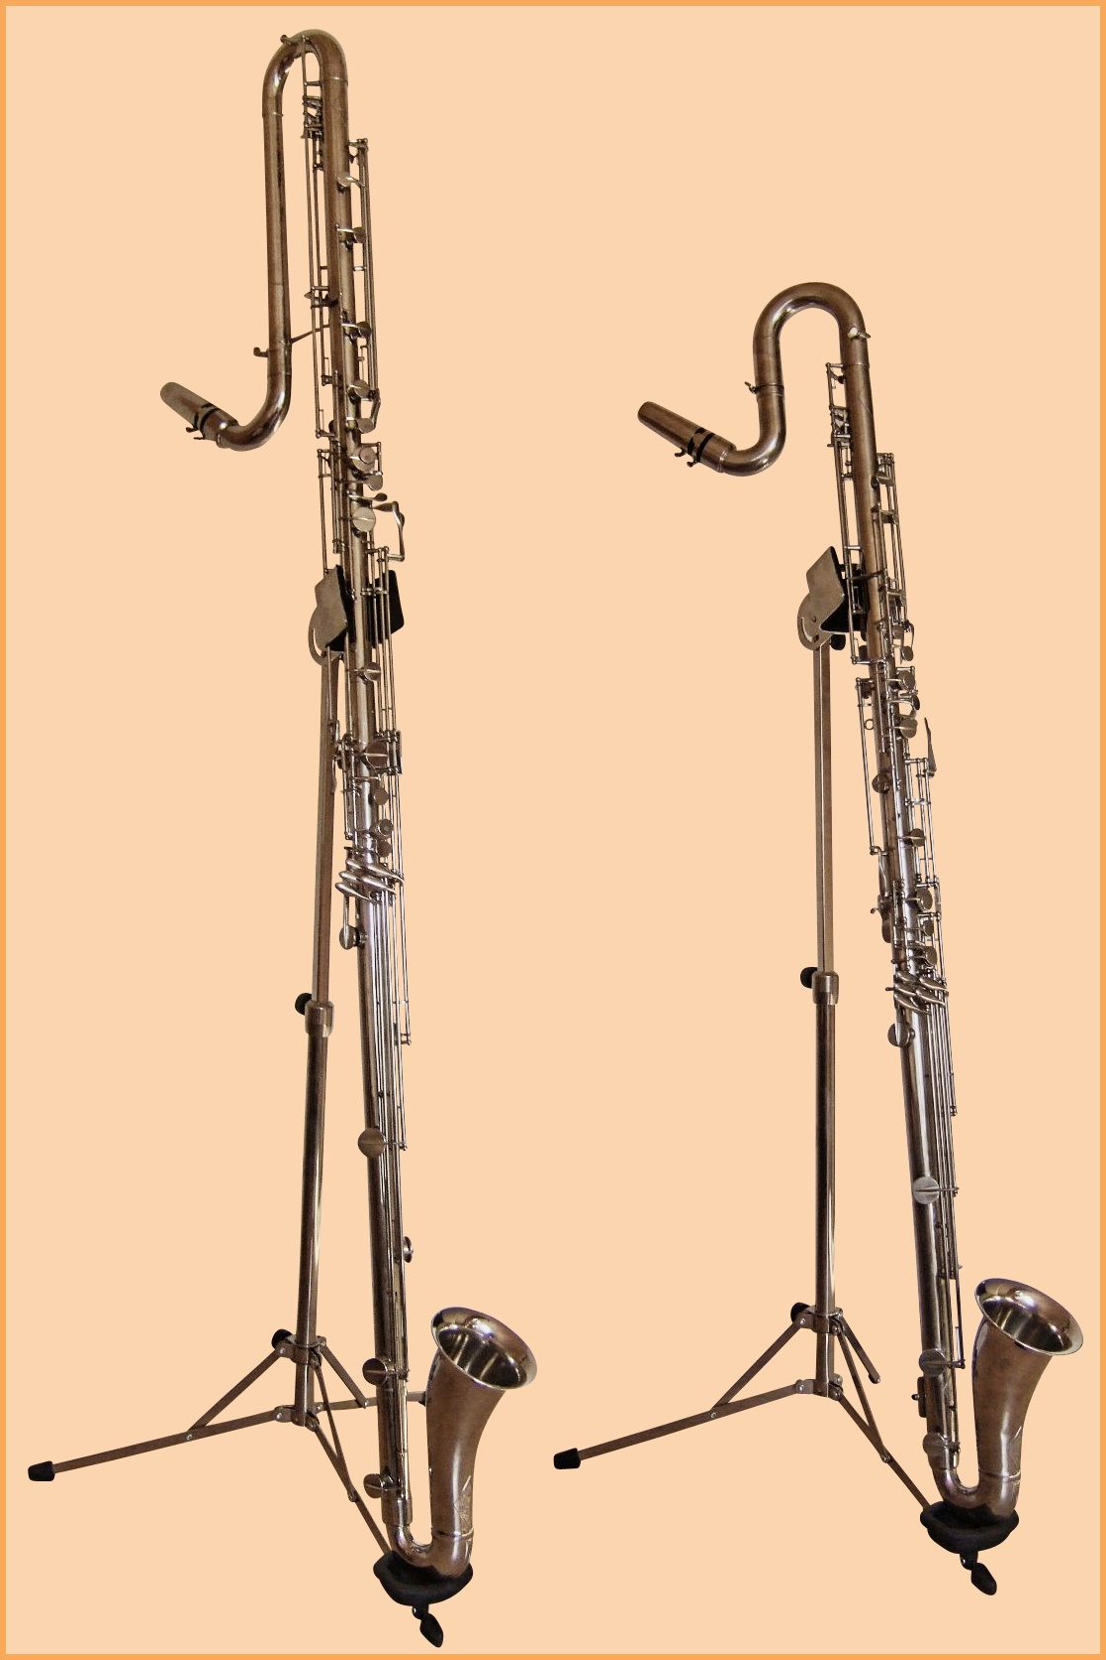 Contrabass and contra-alto clarinets